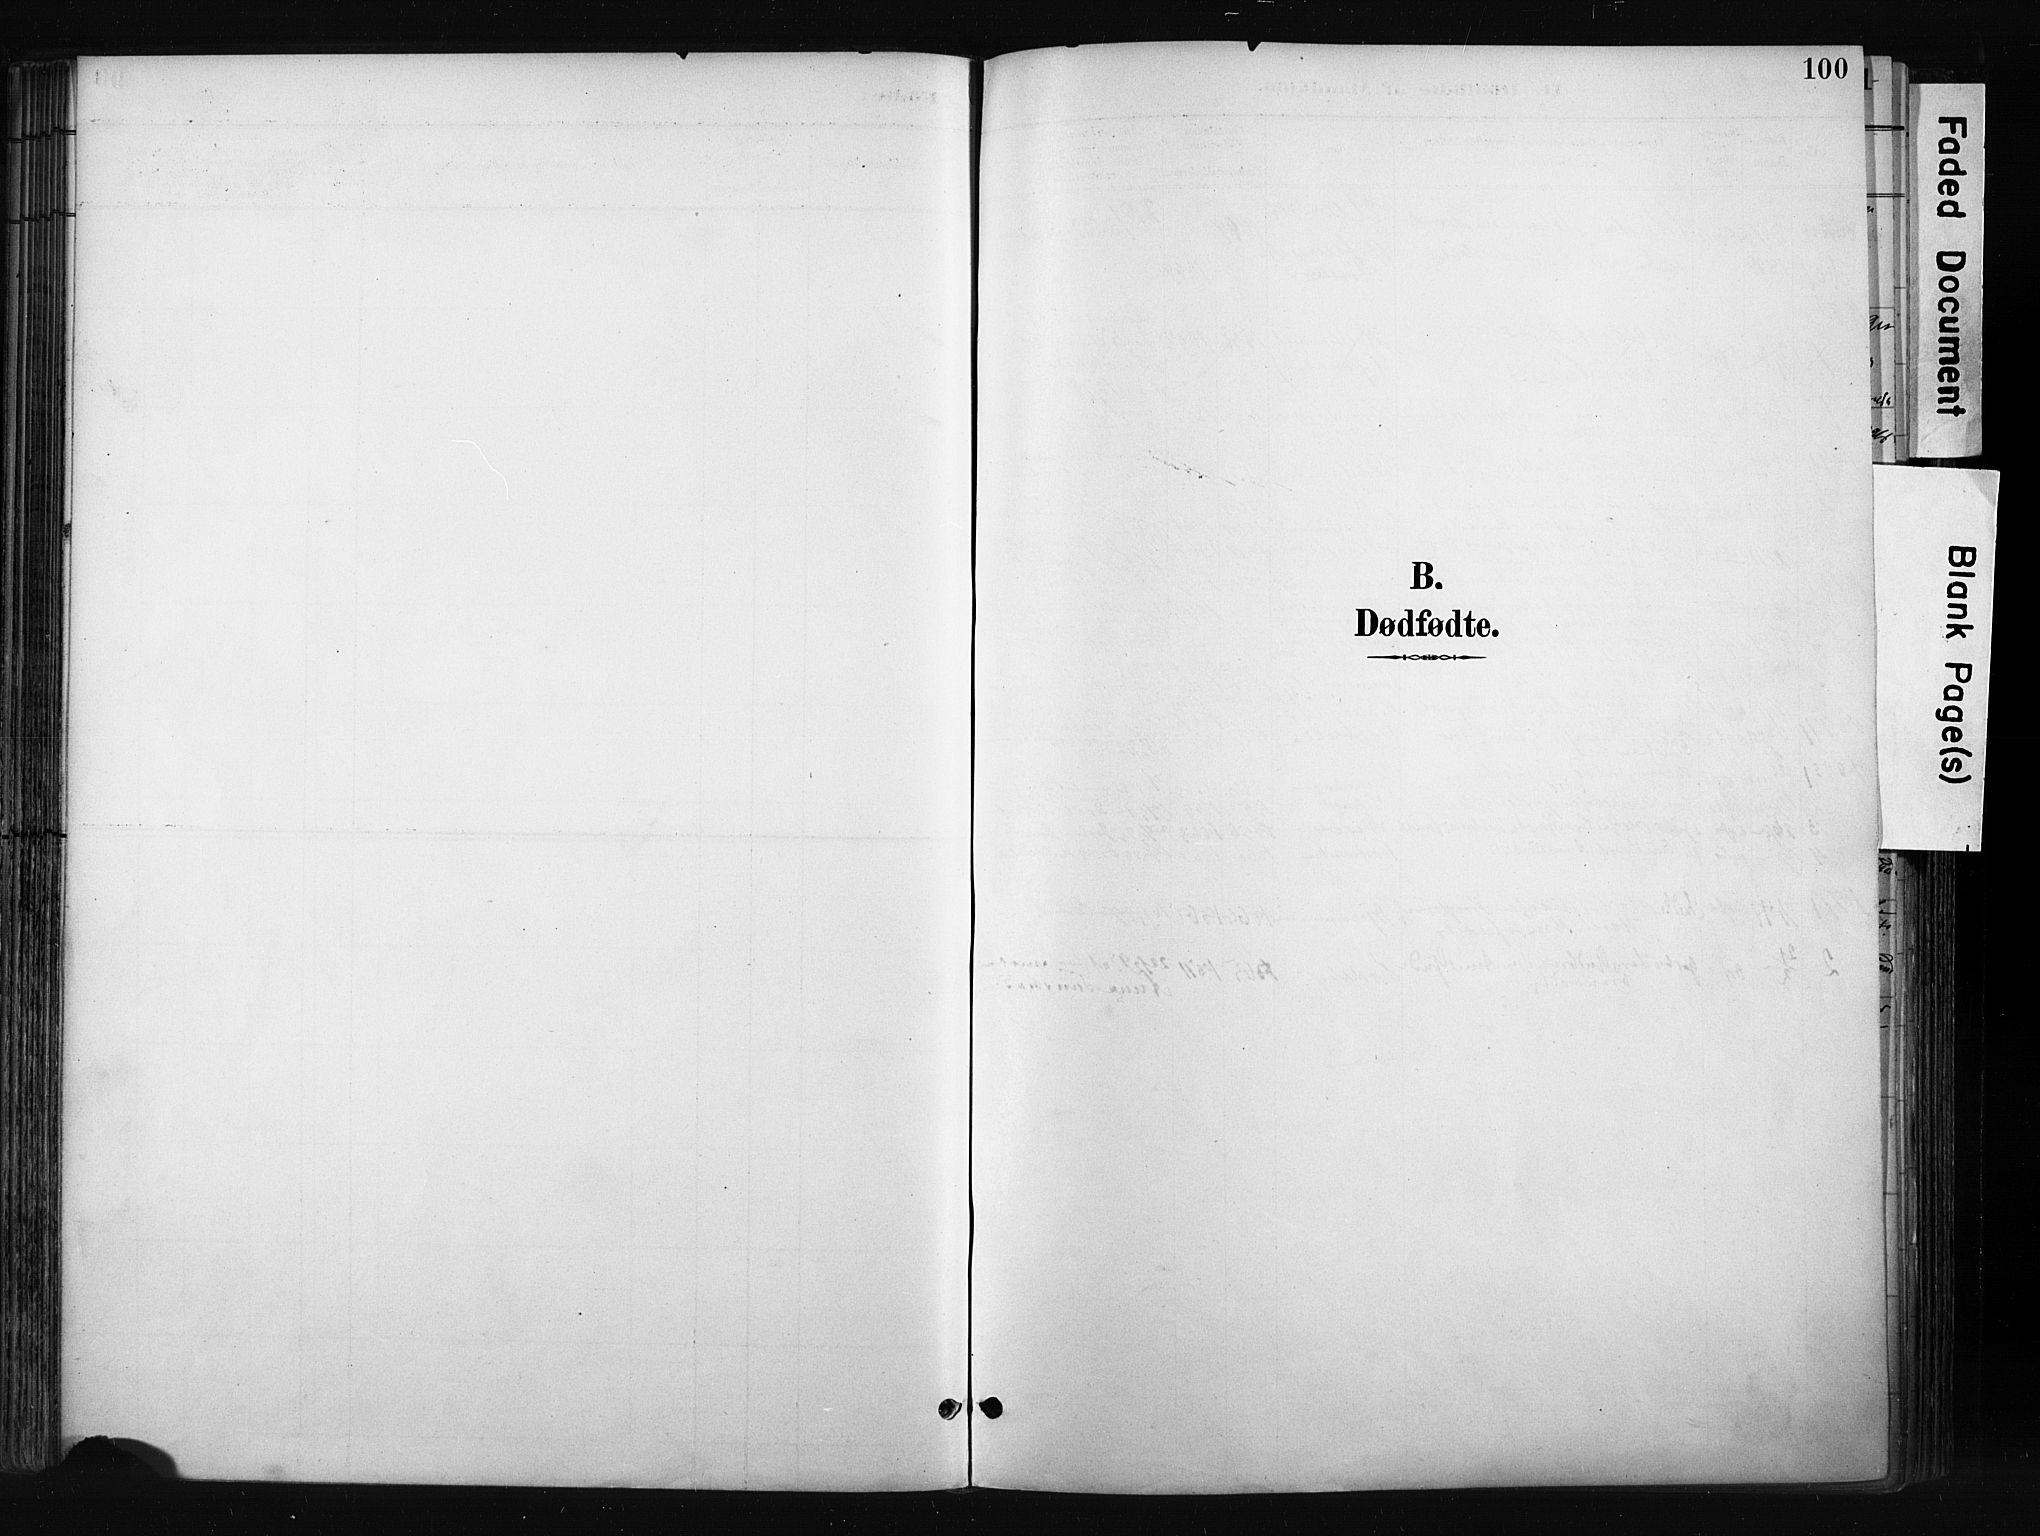 SAH, Gran prestekontor, Ministerialbok nr. 17, 1889-1897, s. 100